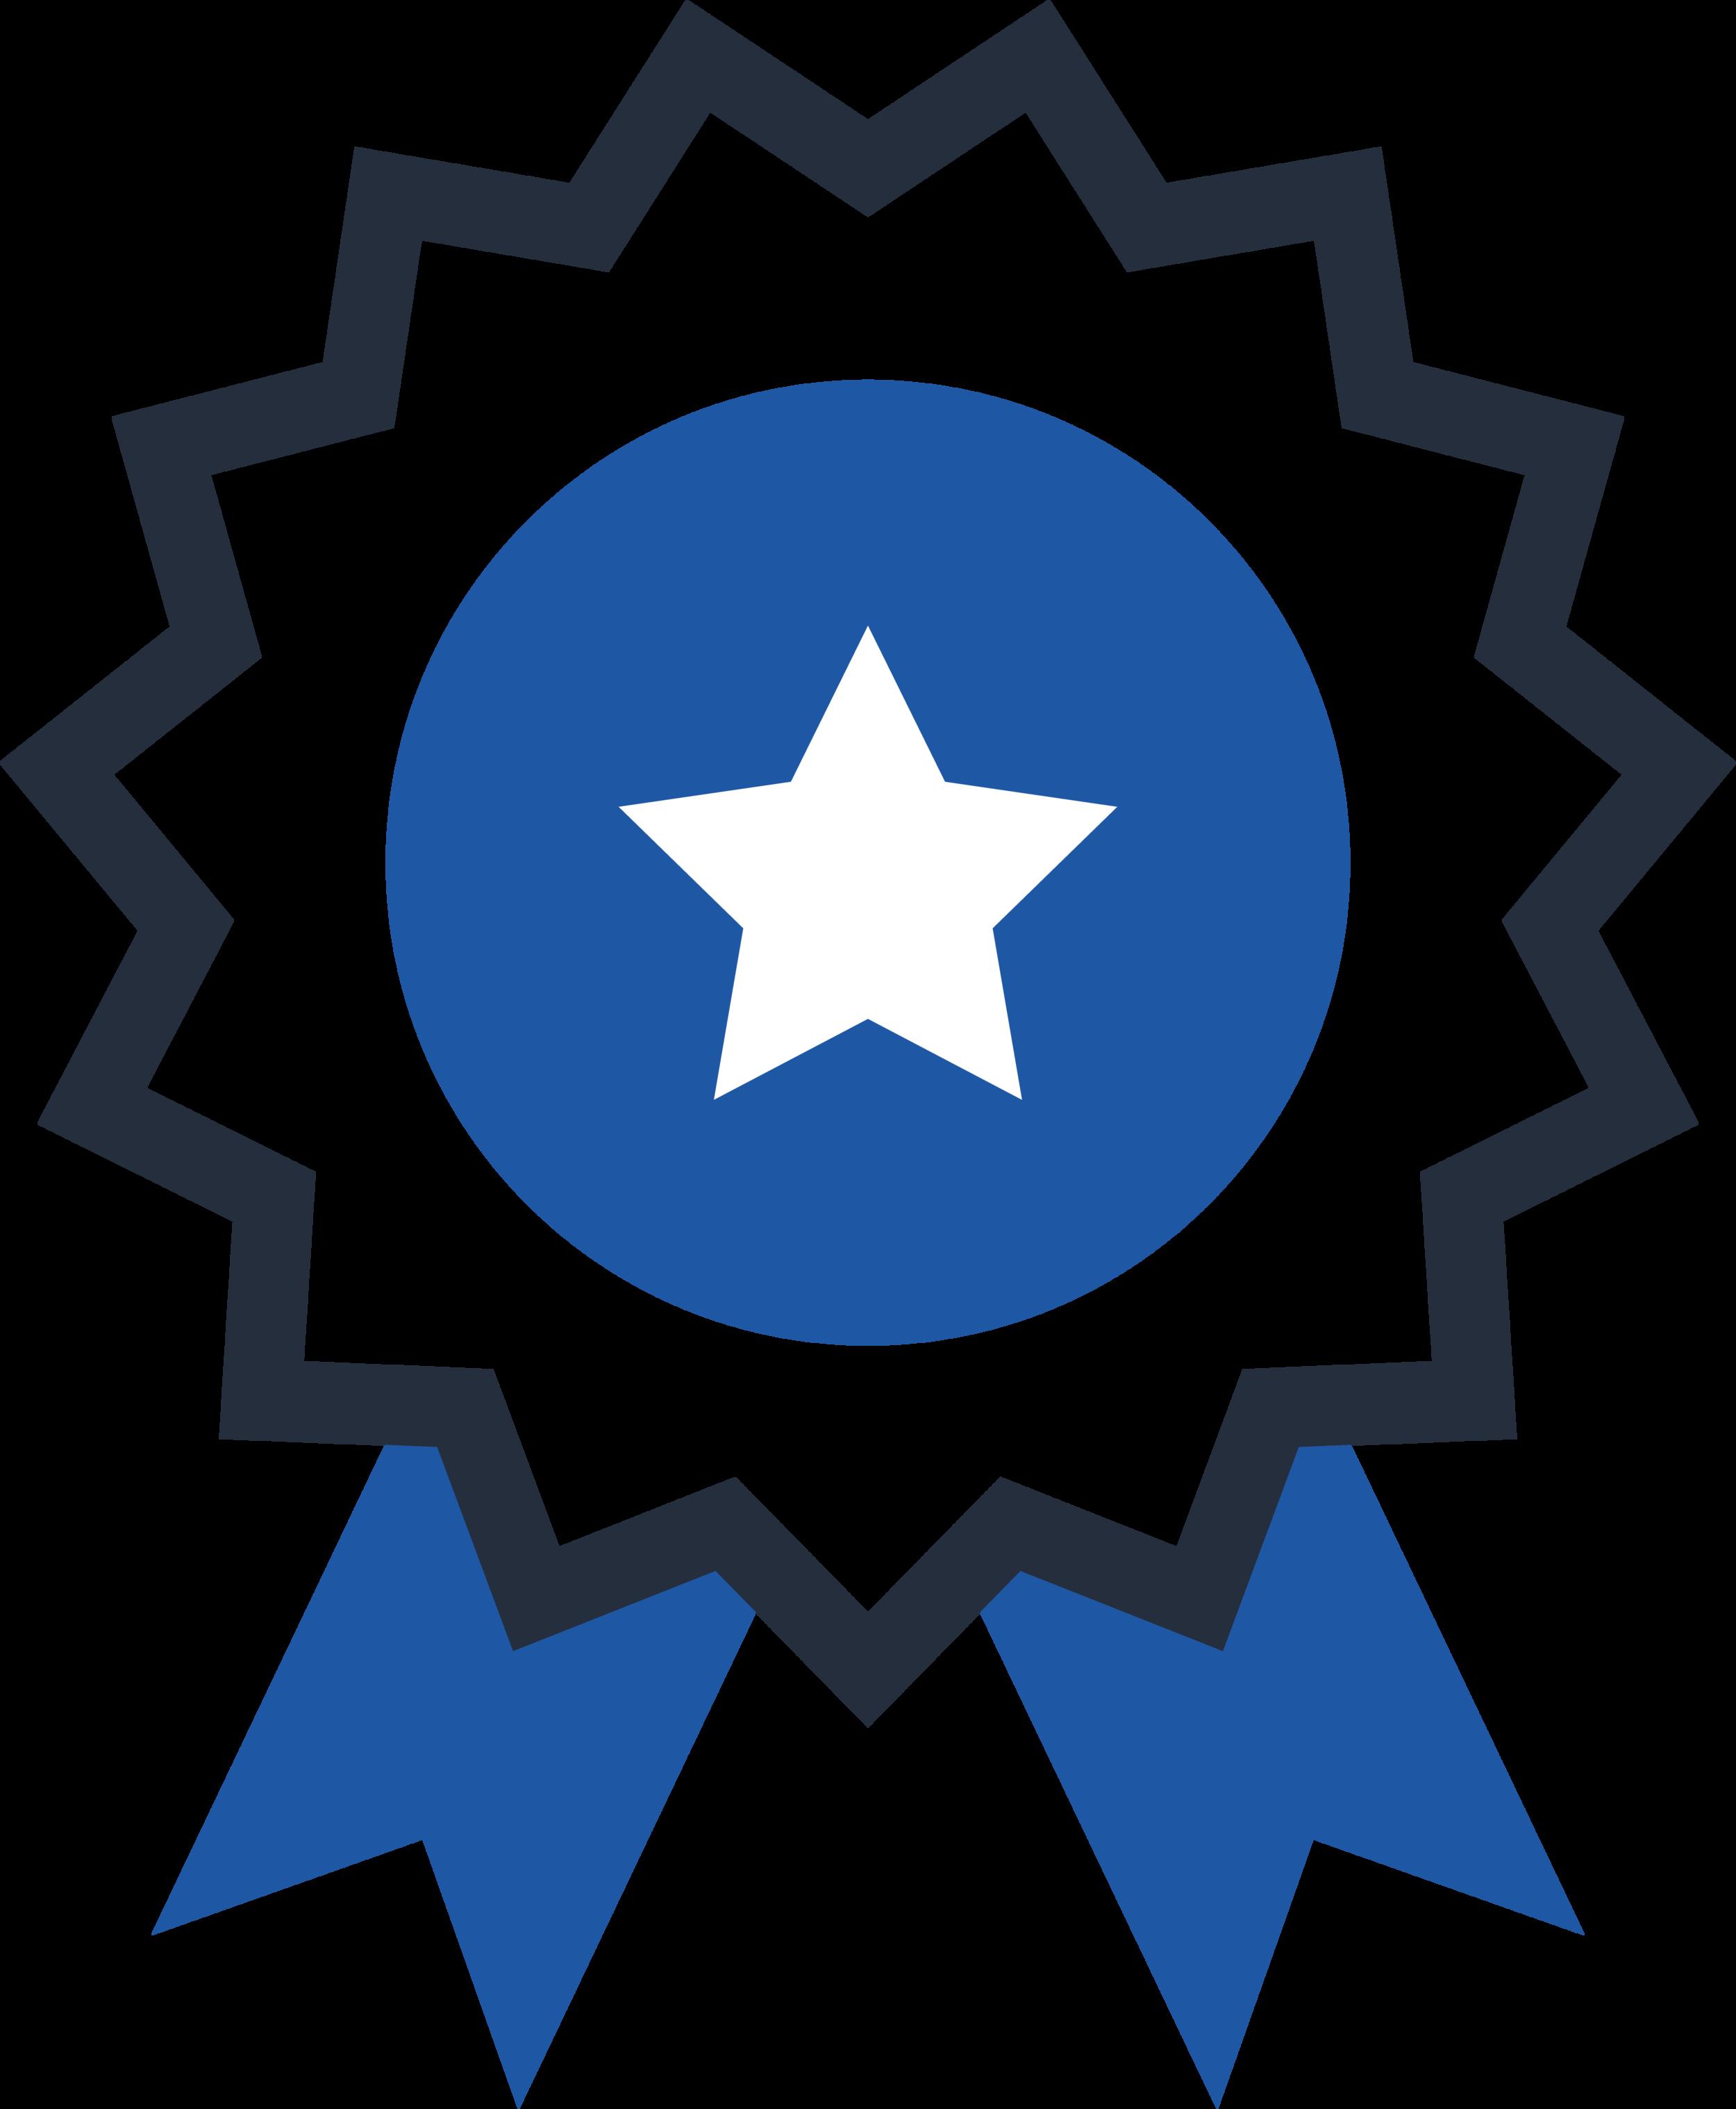 Auszeichnung_blau.png